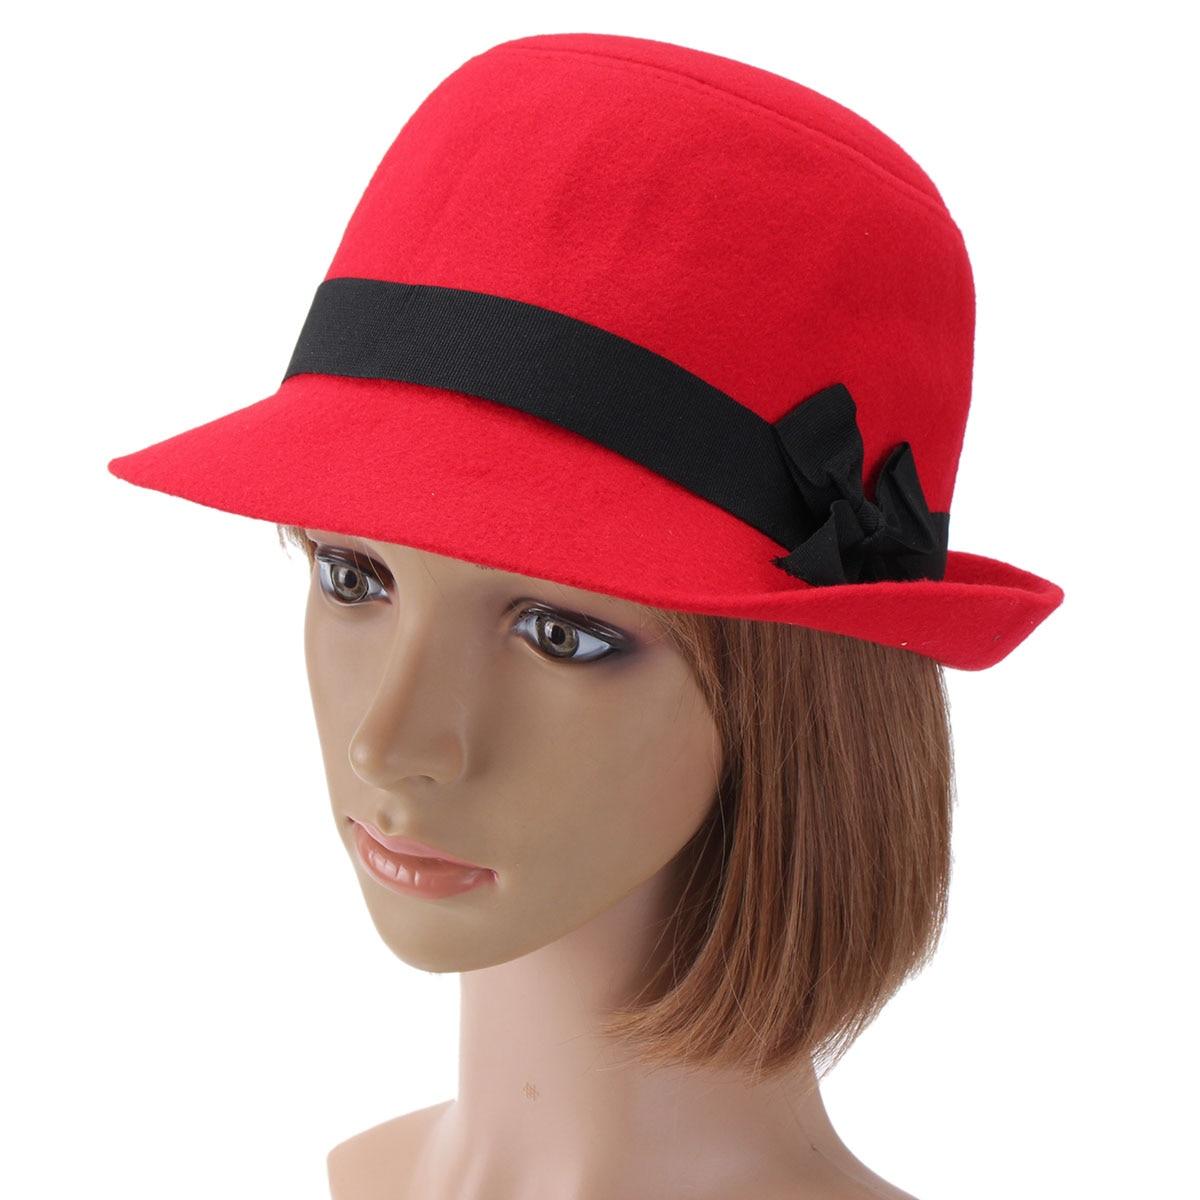 Vintage Hat Fashion Women: Fall Winter Women Hard Fedoras Vintage Fashion Polyeste